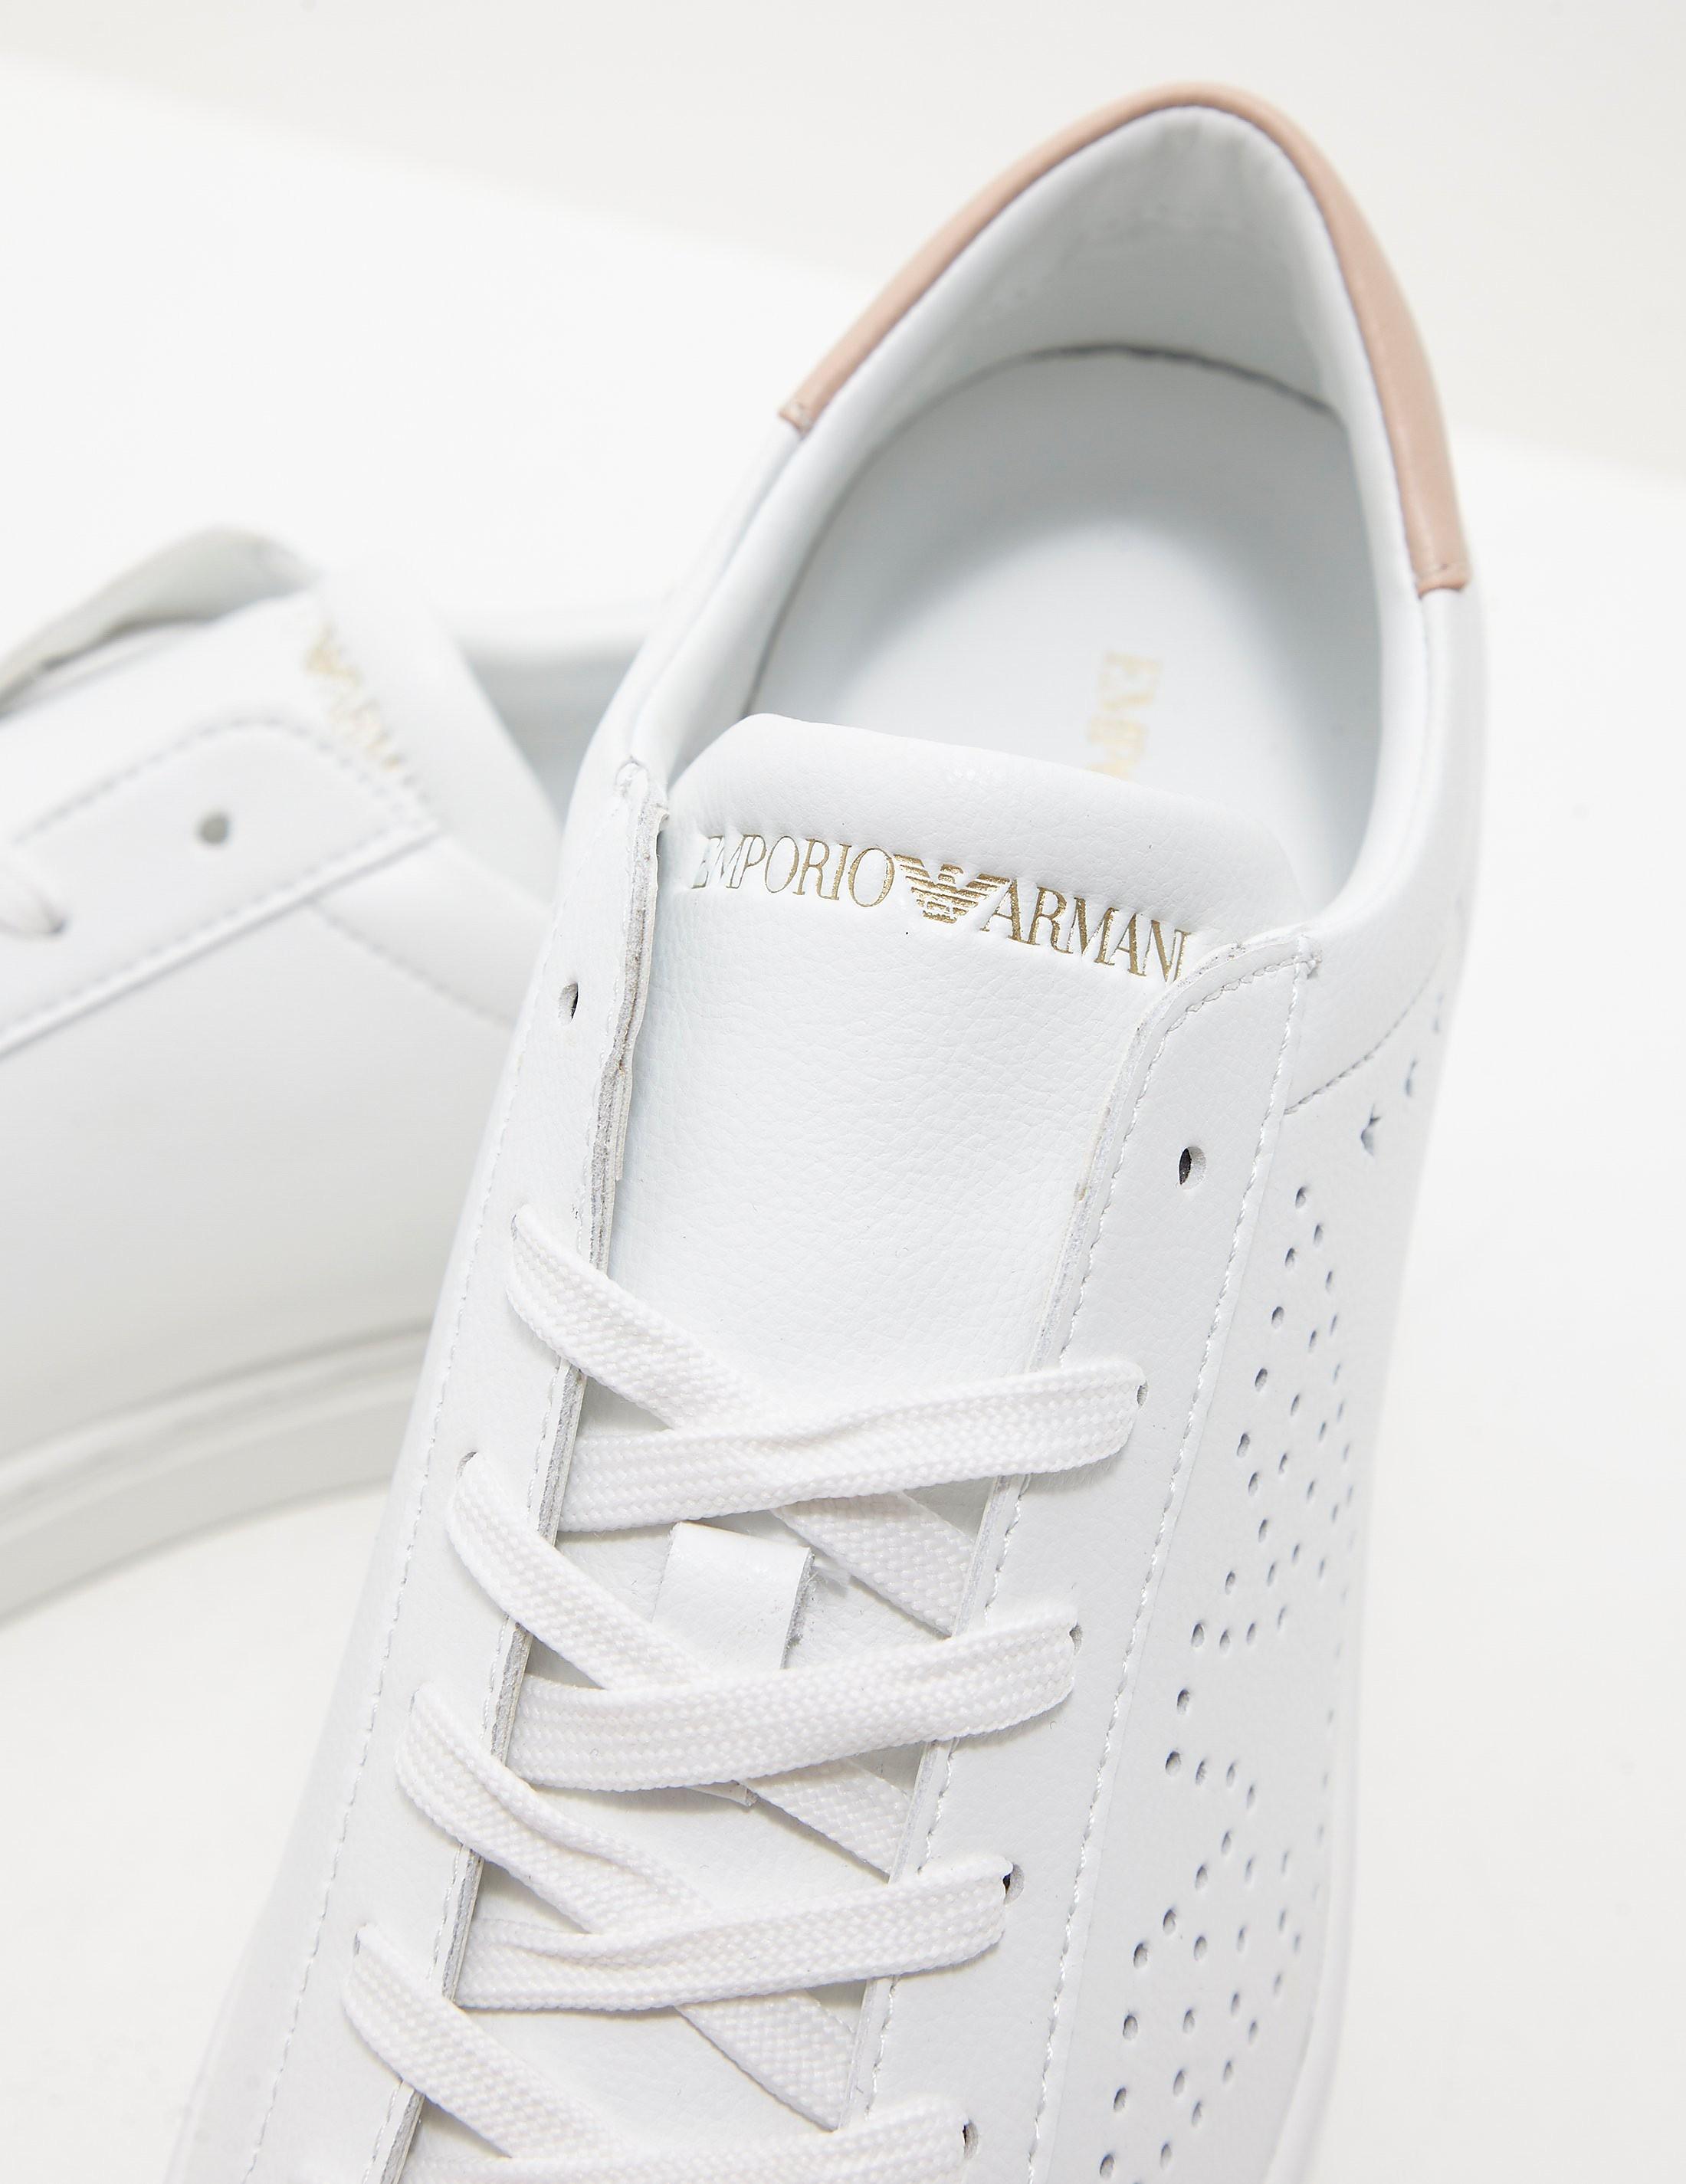 Emporio Armani Shara Sneakers